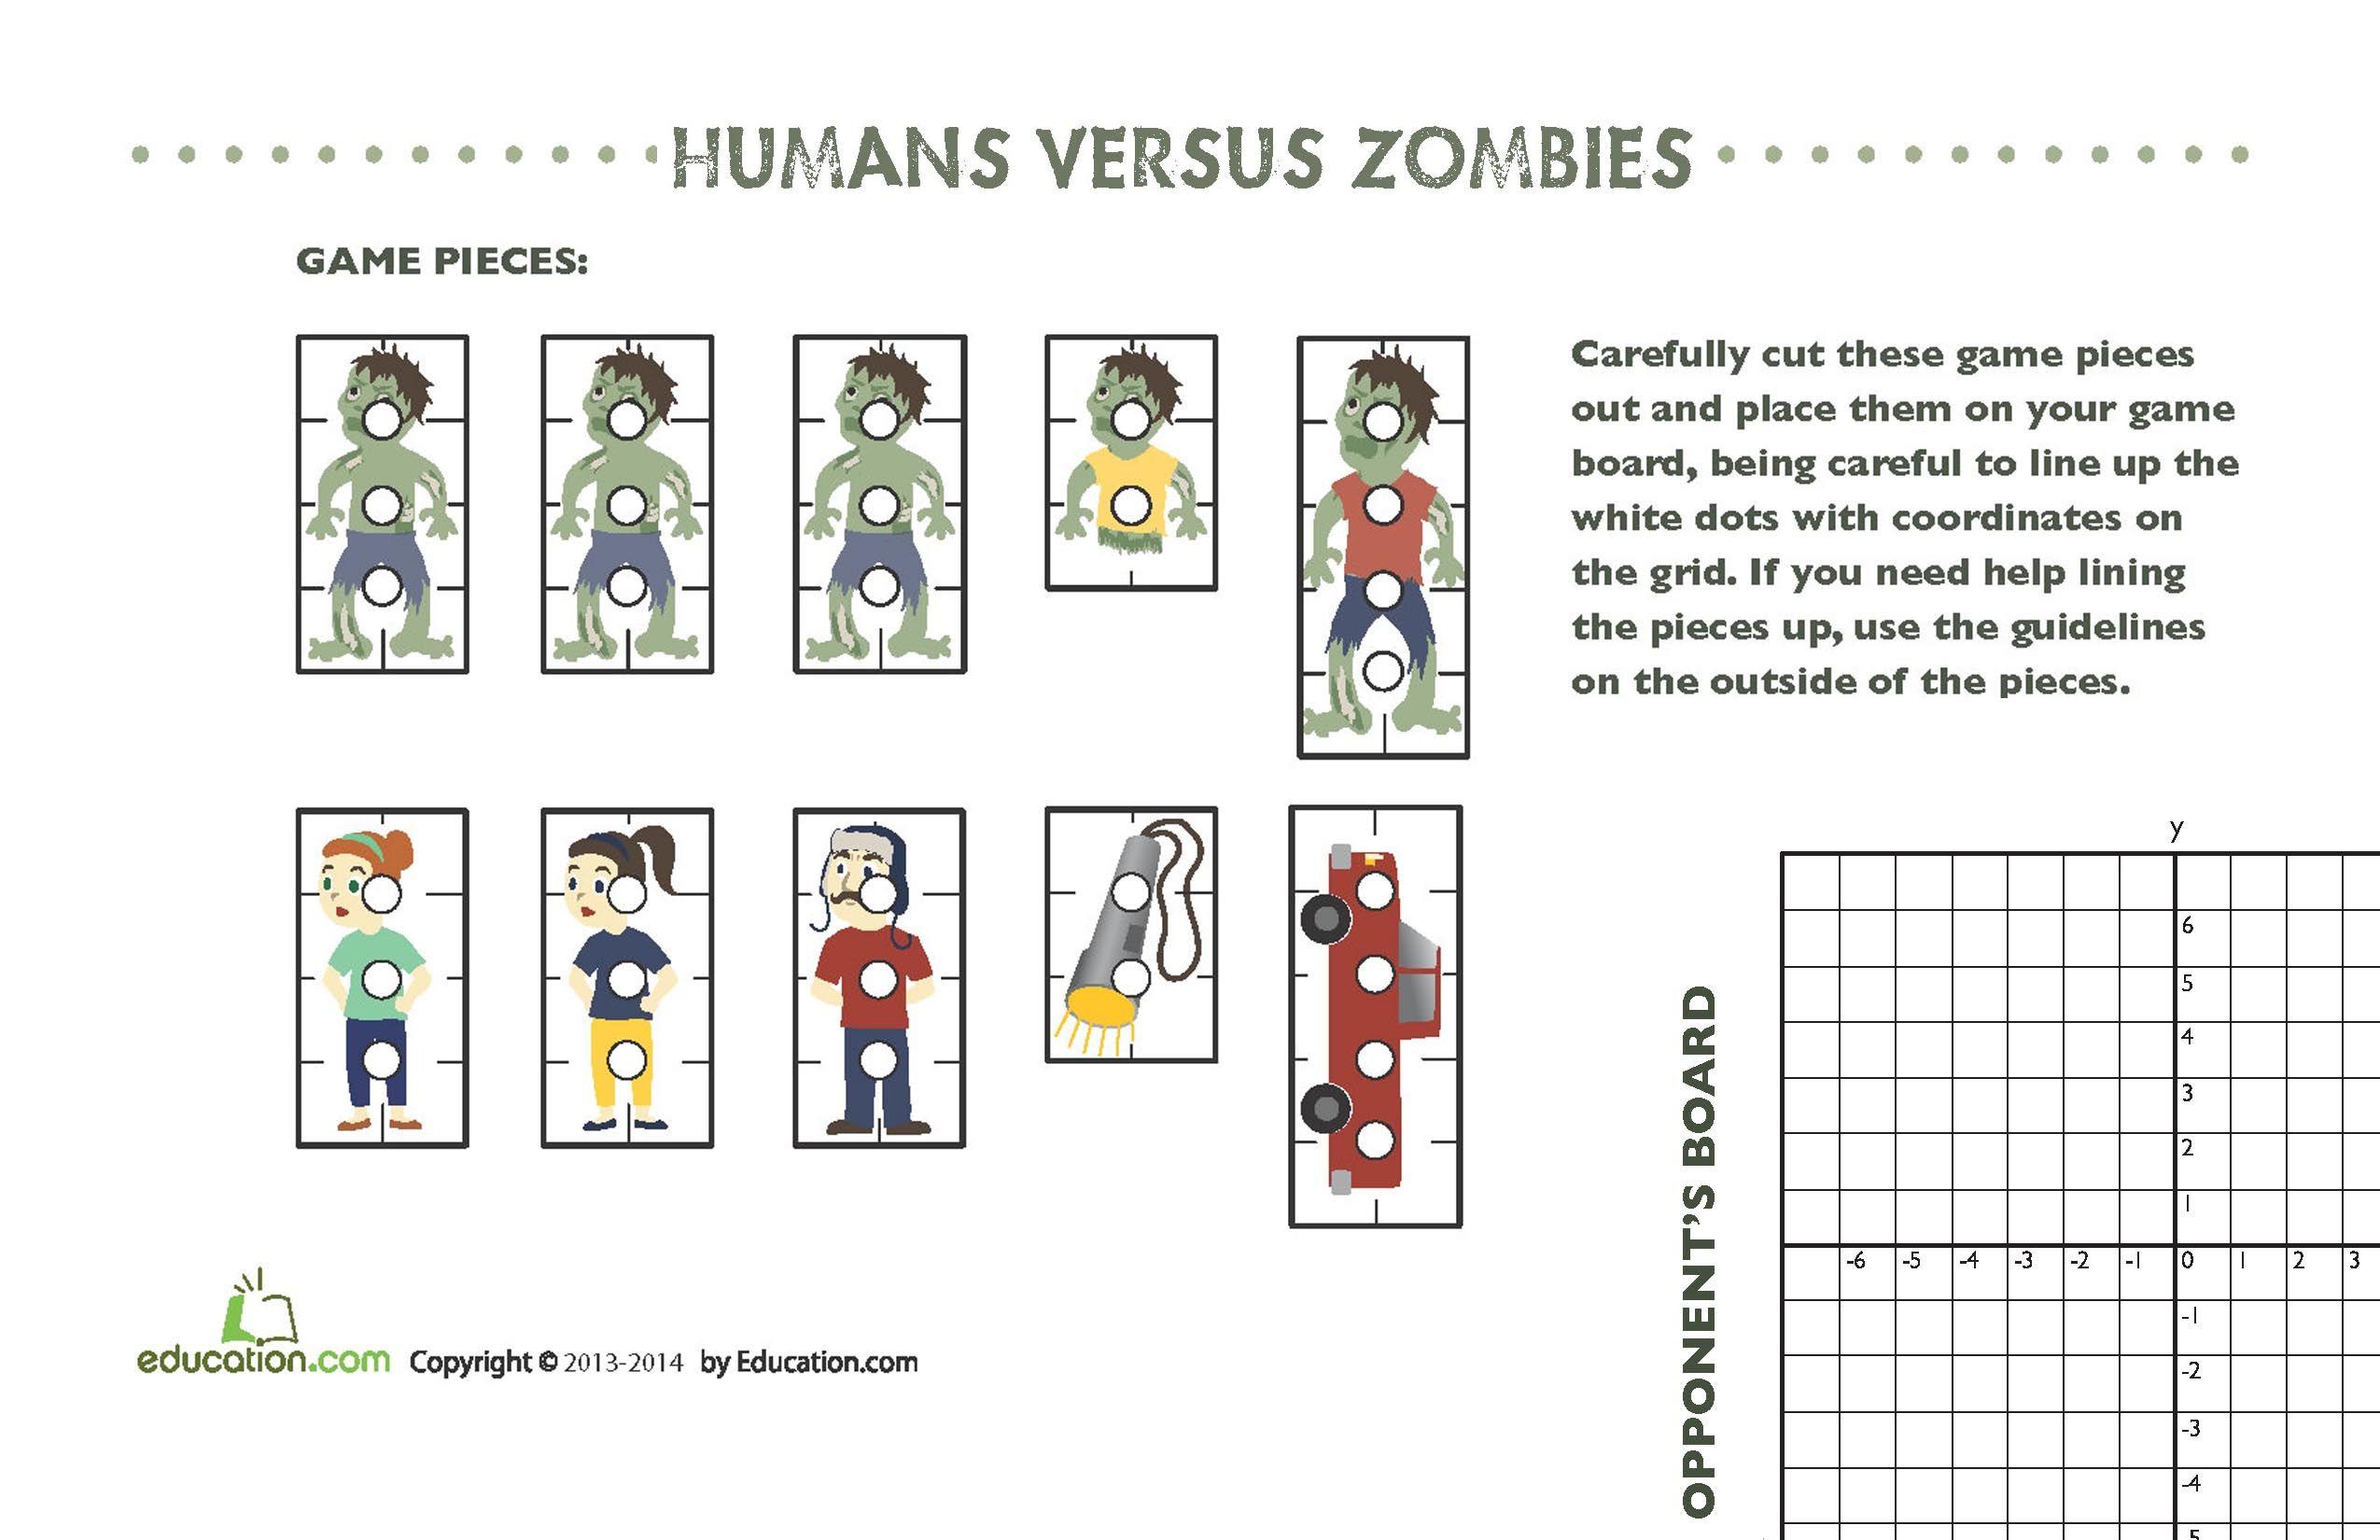 Zombie Game Worksheet Education Com Language Experience Education Com Language Therapy [ 1650 x 2550 Pixel ]